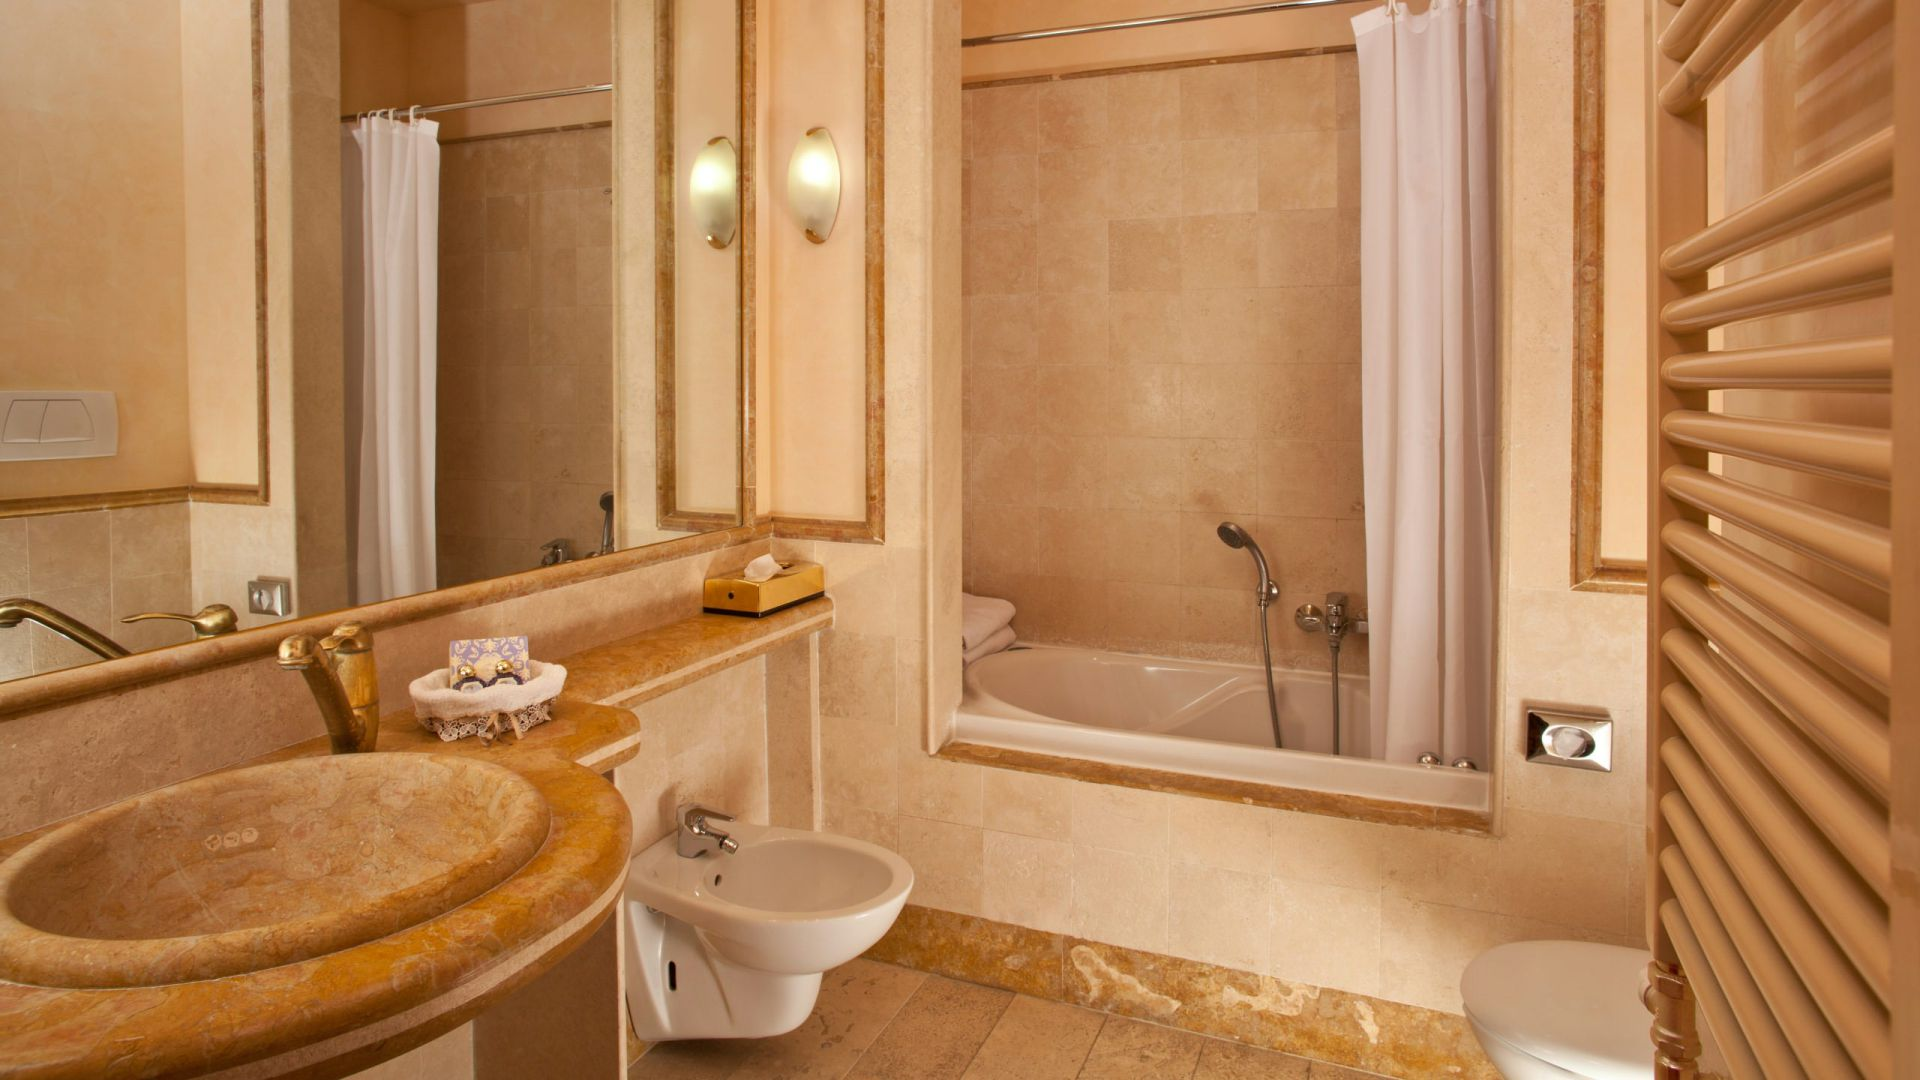 albergo-ottocento-rome-salle-de-bain-18